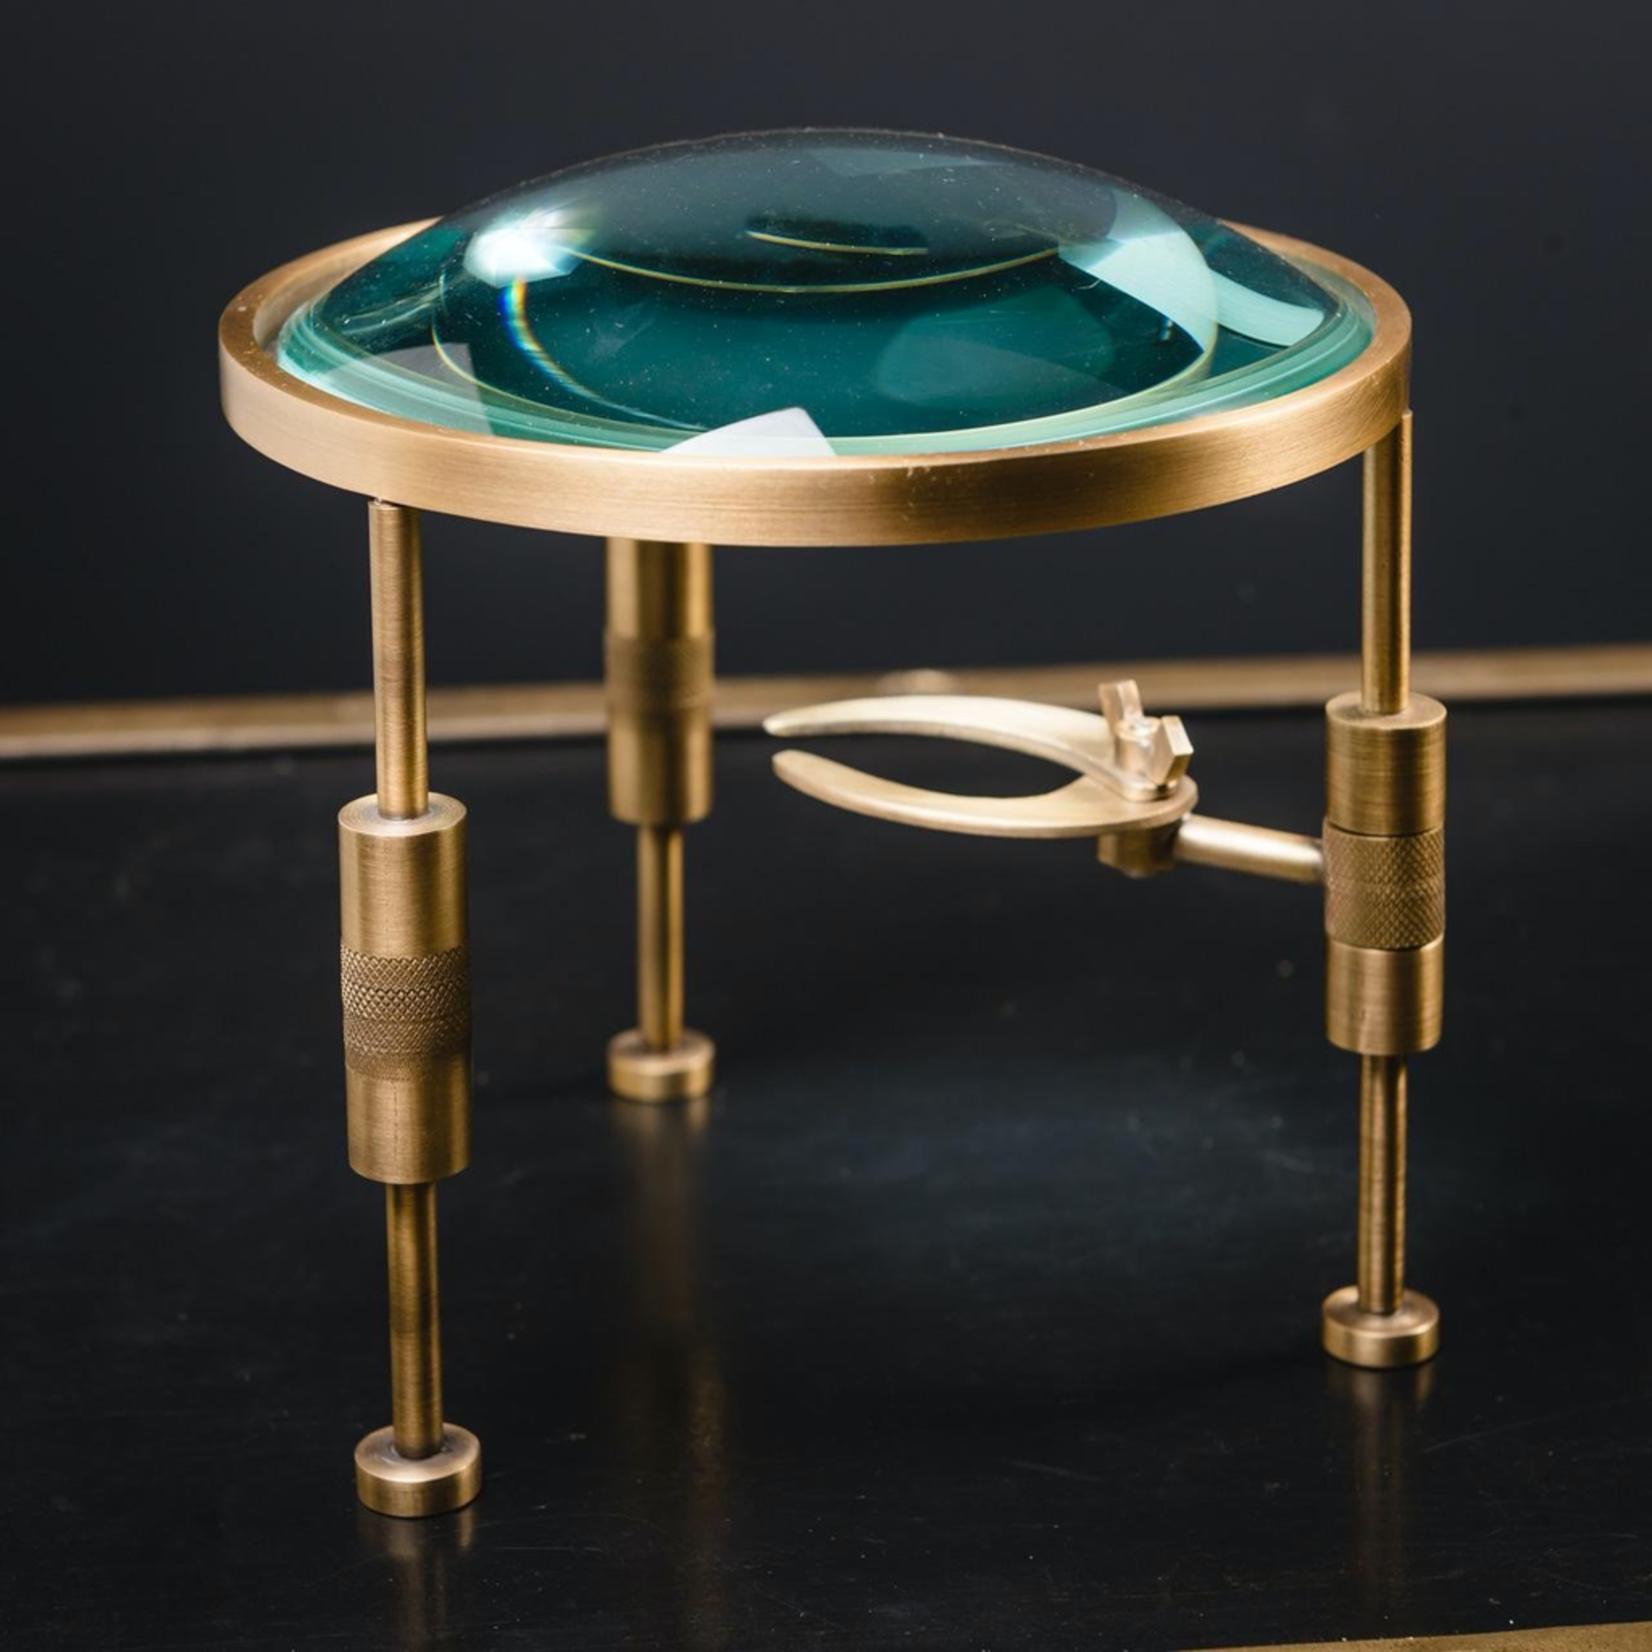 OBJET DE CURIOSITE BUMPY MAGNIFYING GLASS WITH PINCER ON BRASS FEET